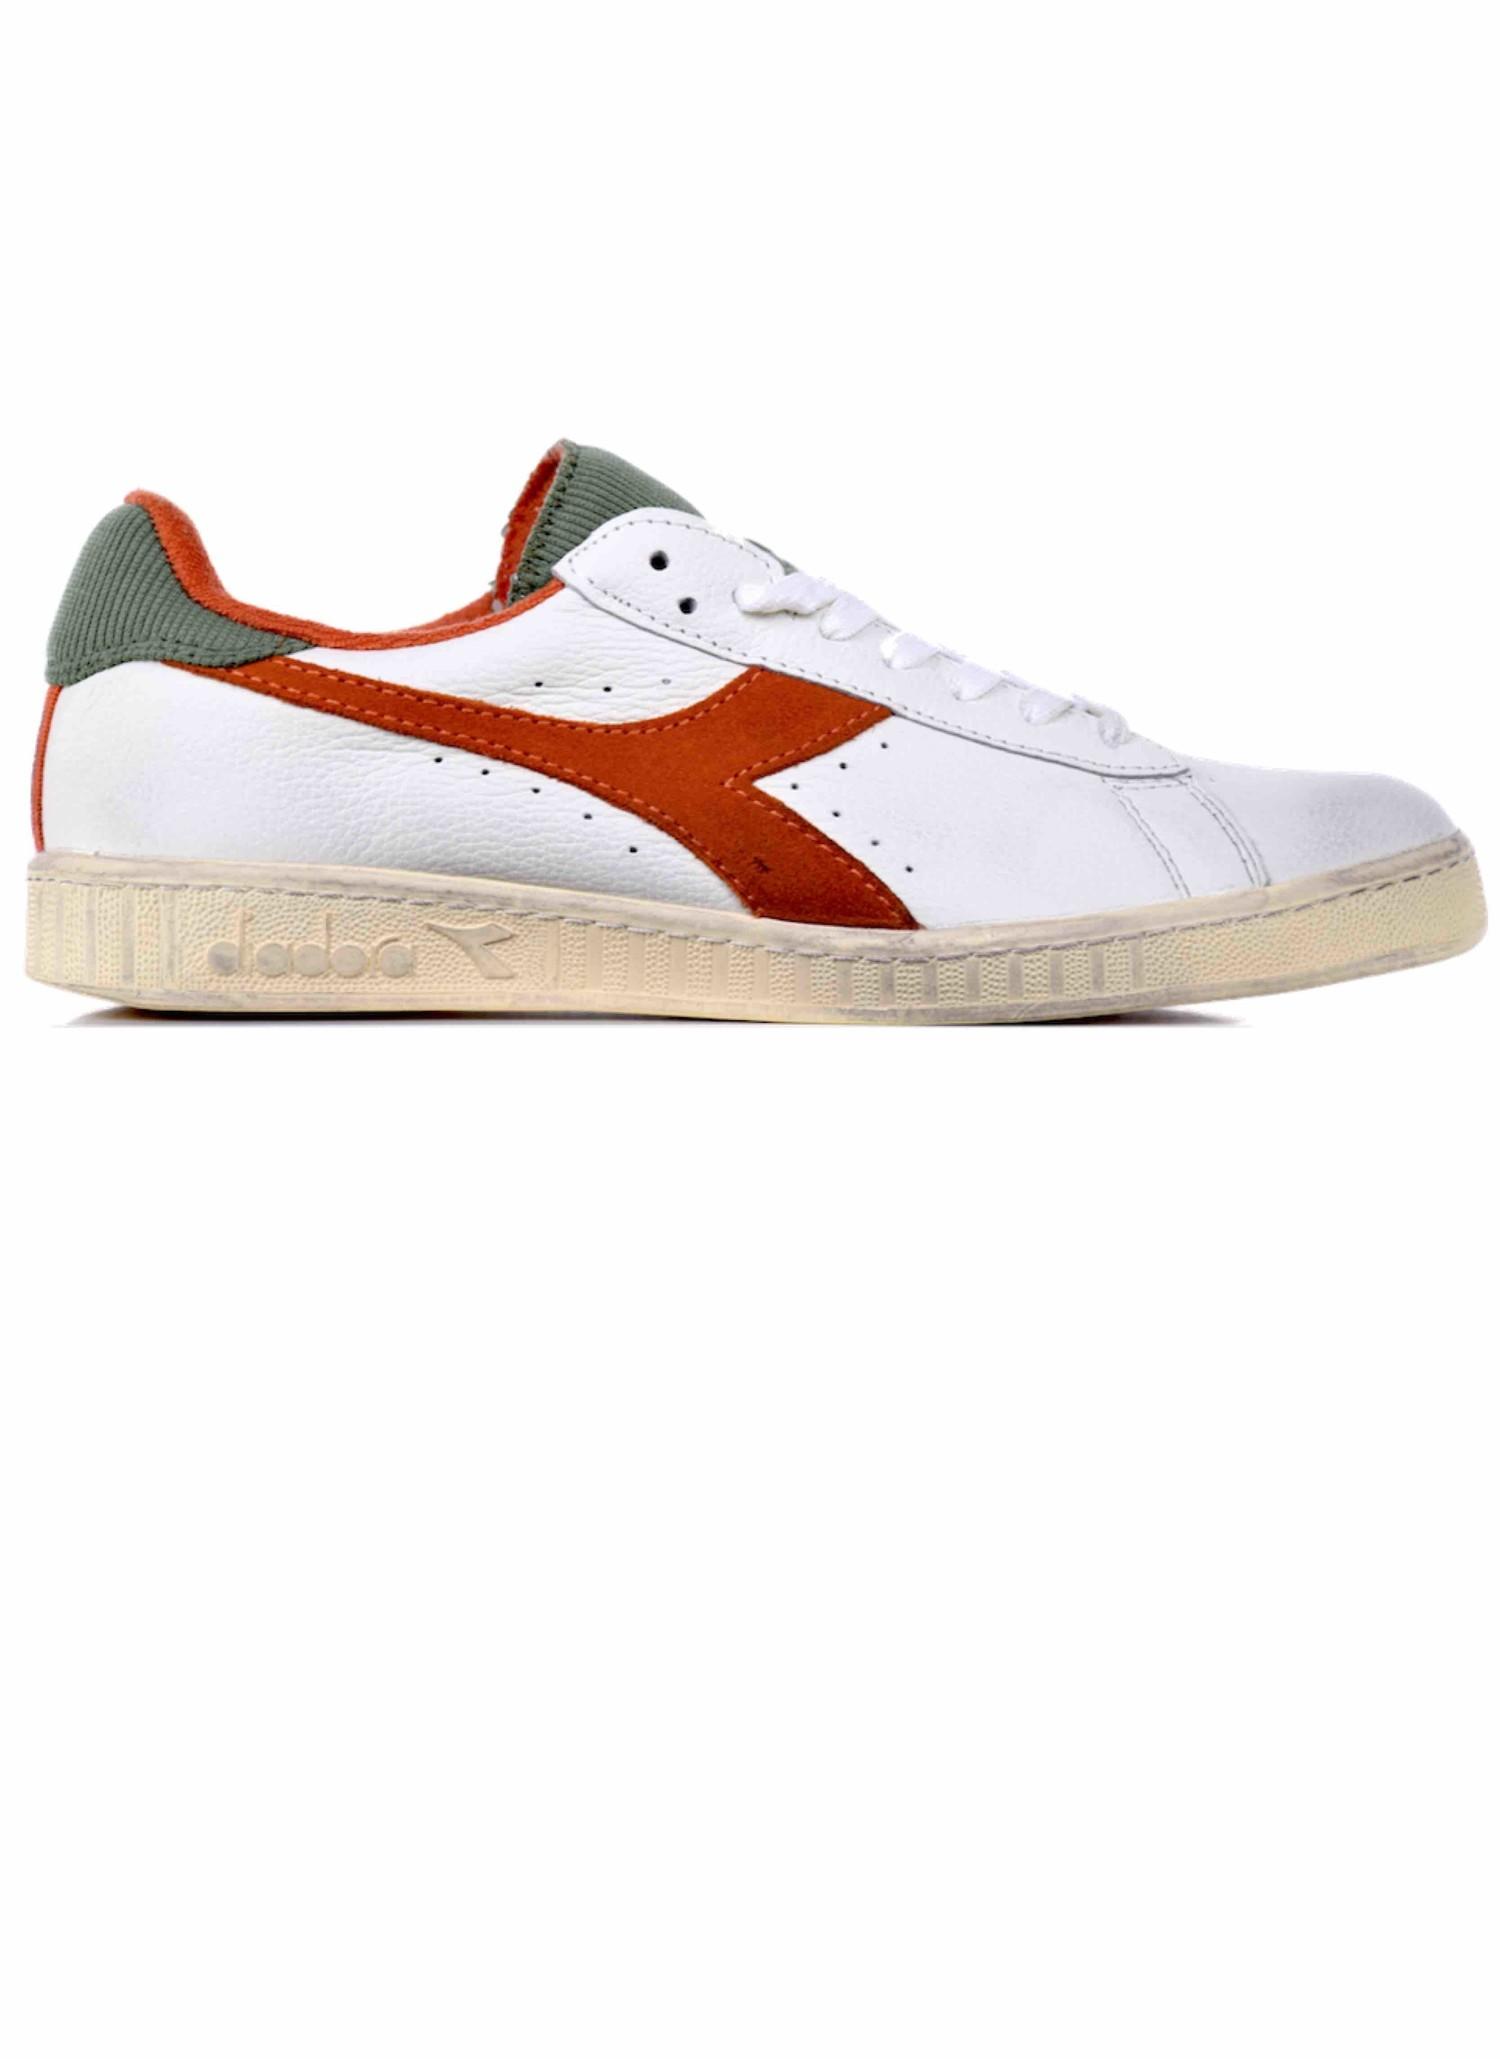 Diadora Game Low Used Sneakers Orange